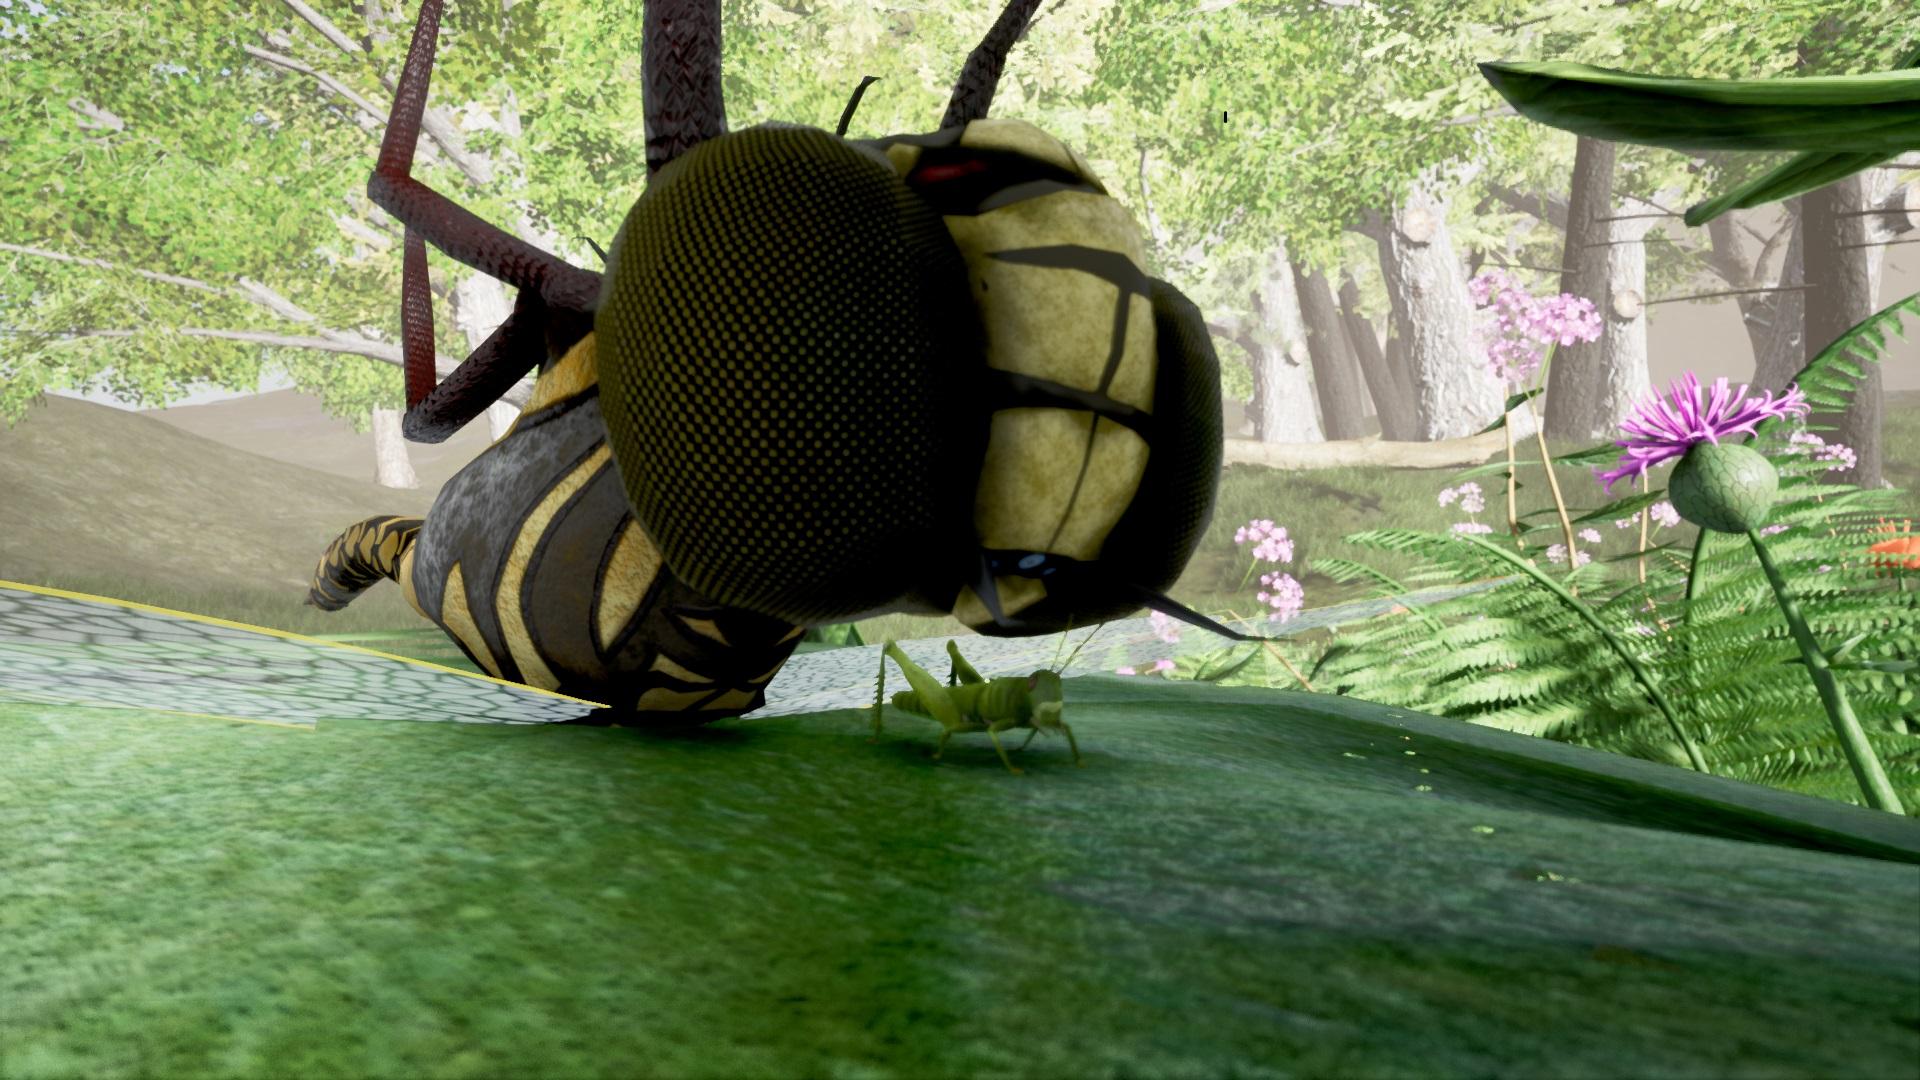 Tiny Grasshopper Under a Giant D